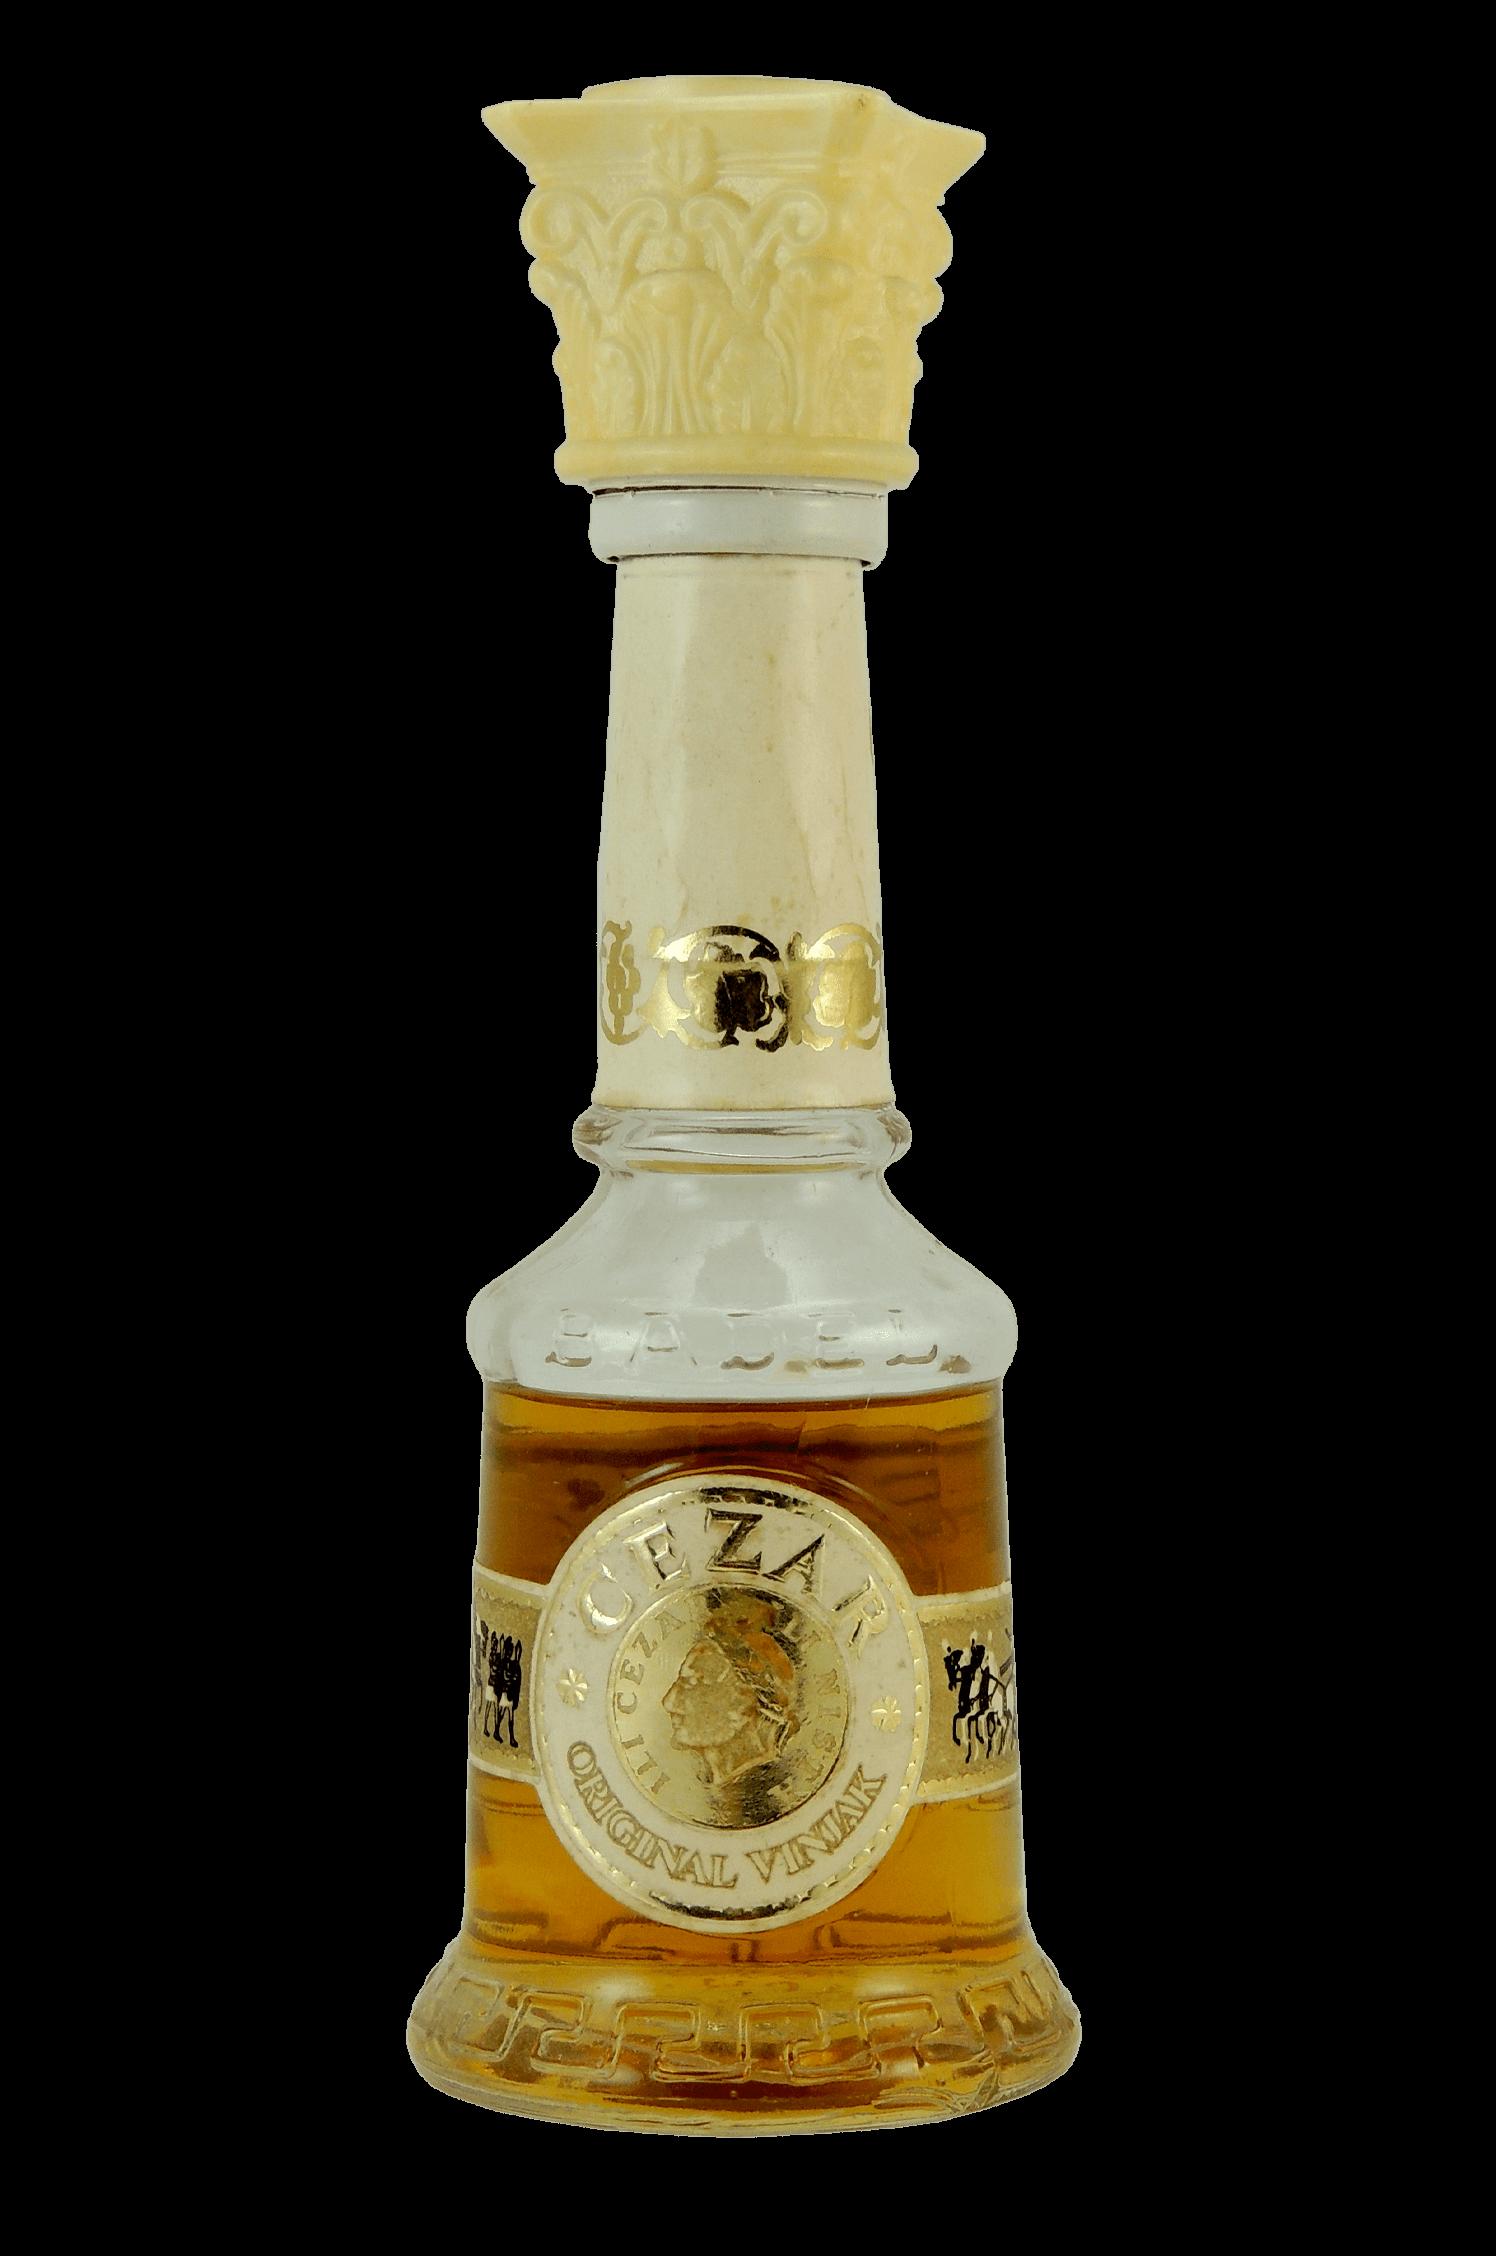 Cezar Original Viniak